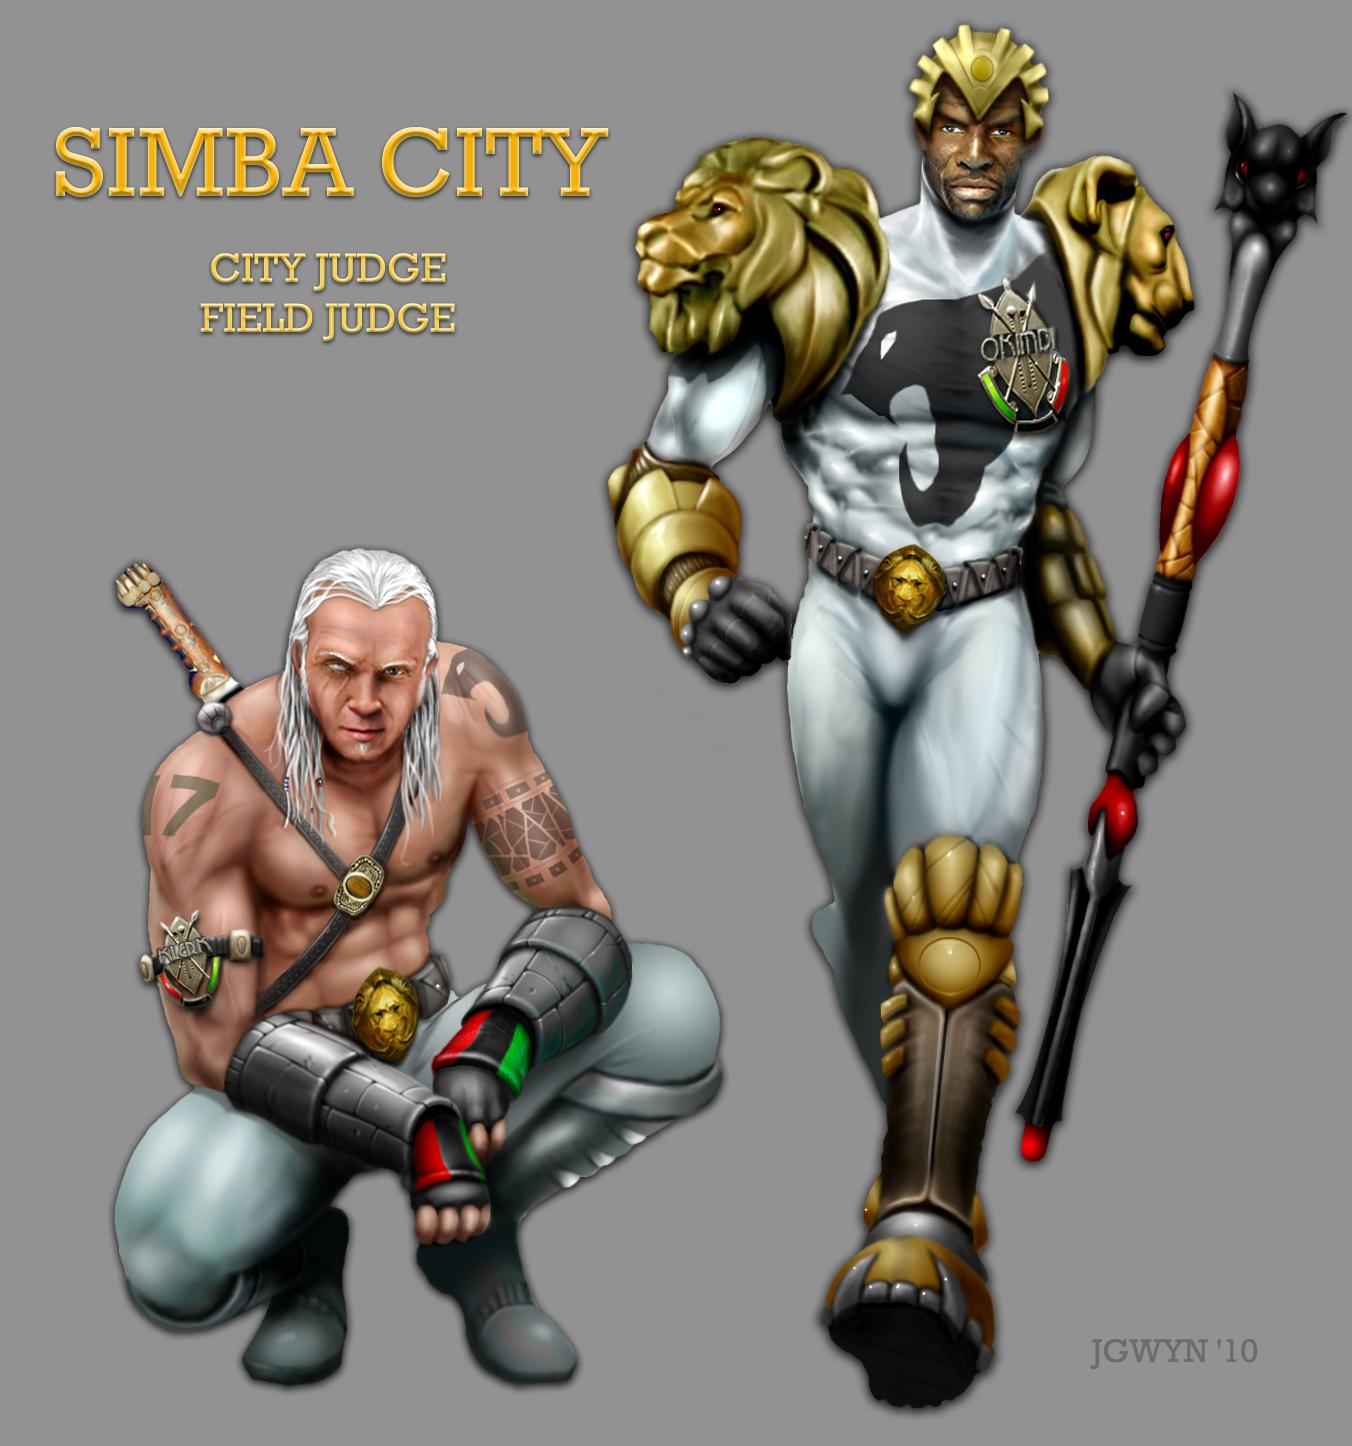 SimbaCityFlat1.jpg